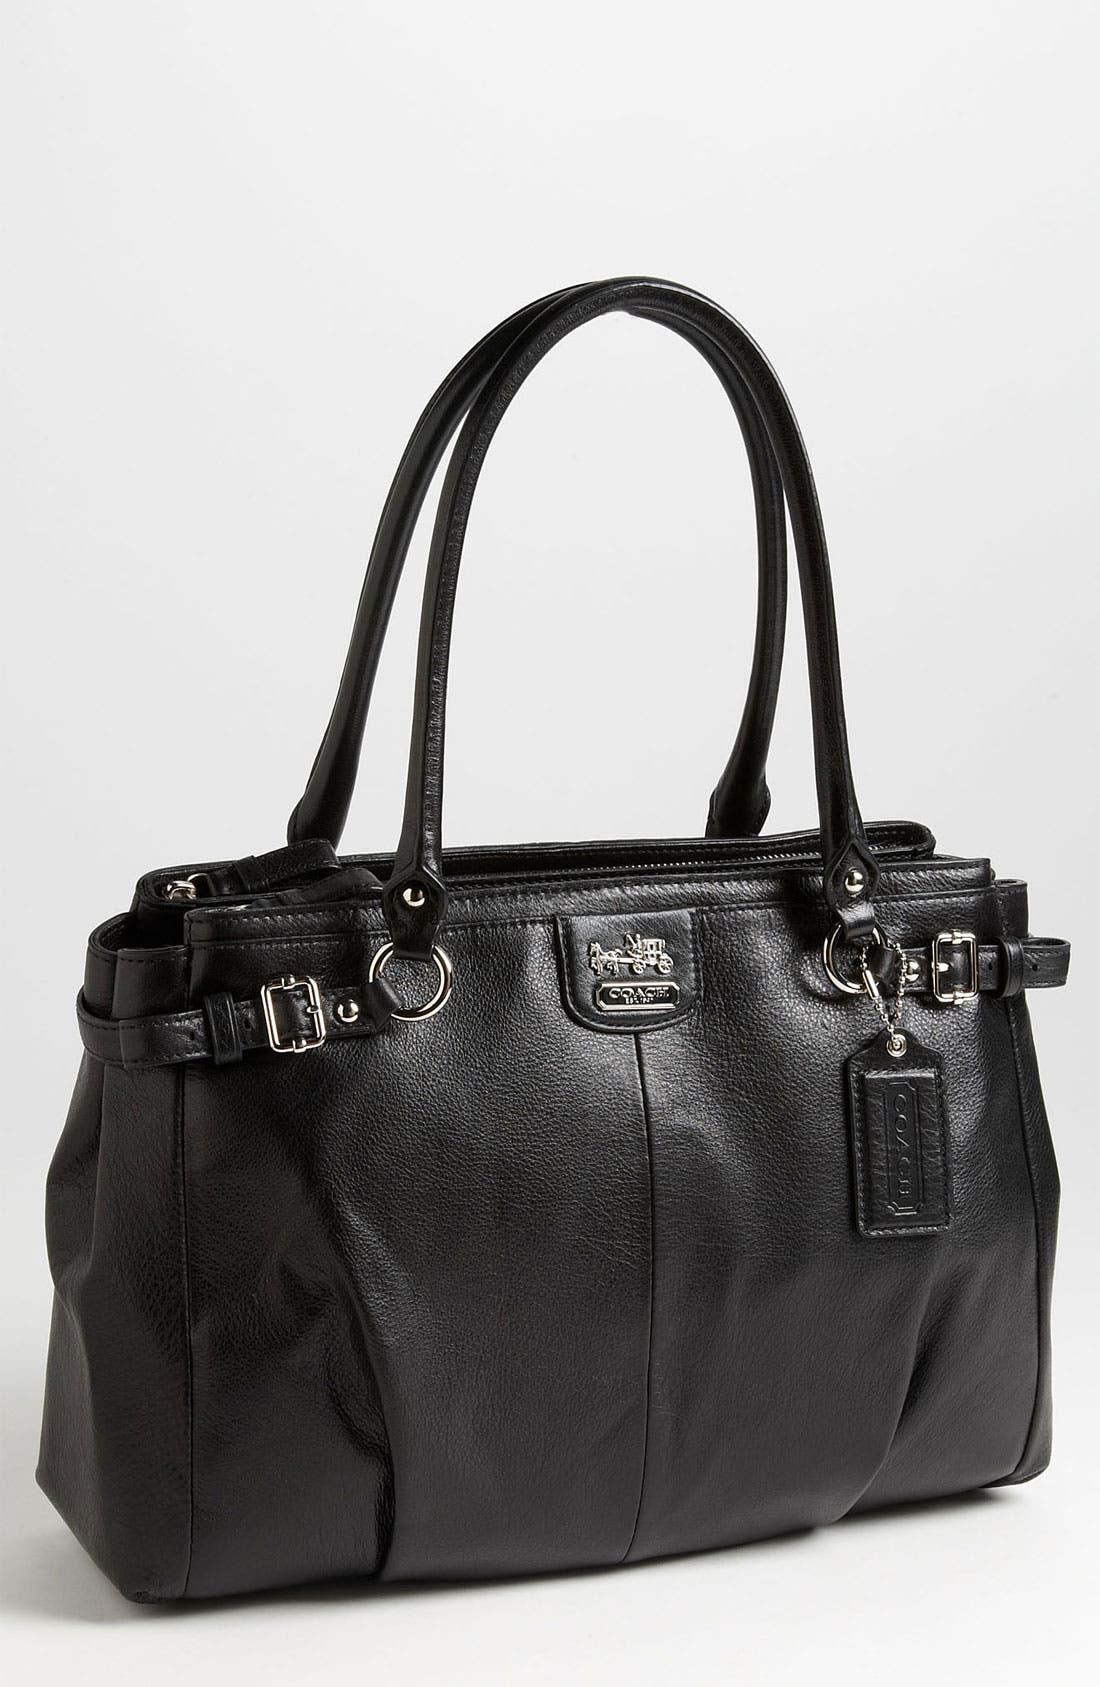 Alternate Image 1 Selected - COACH 'Madison - Kara' Leather Carryall